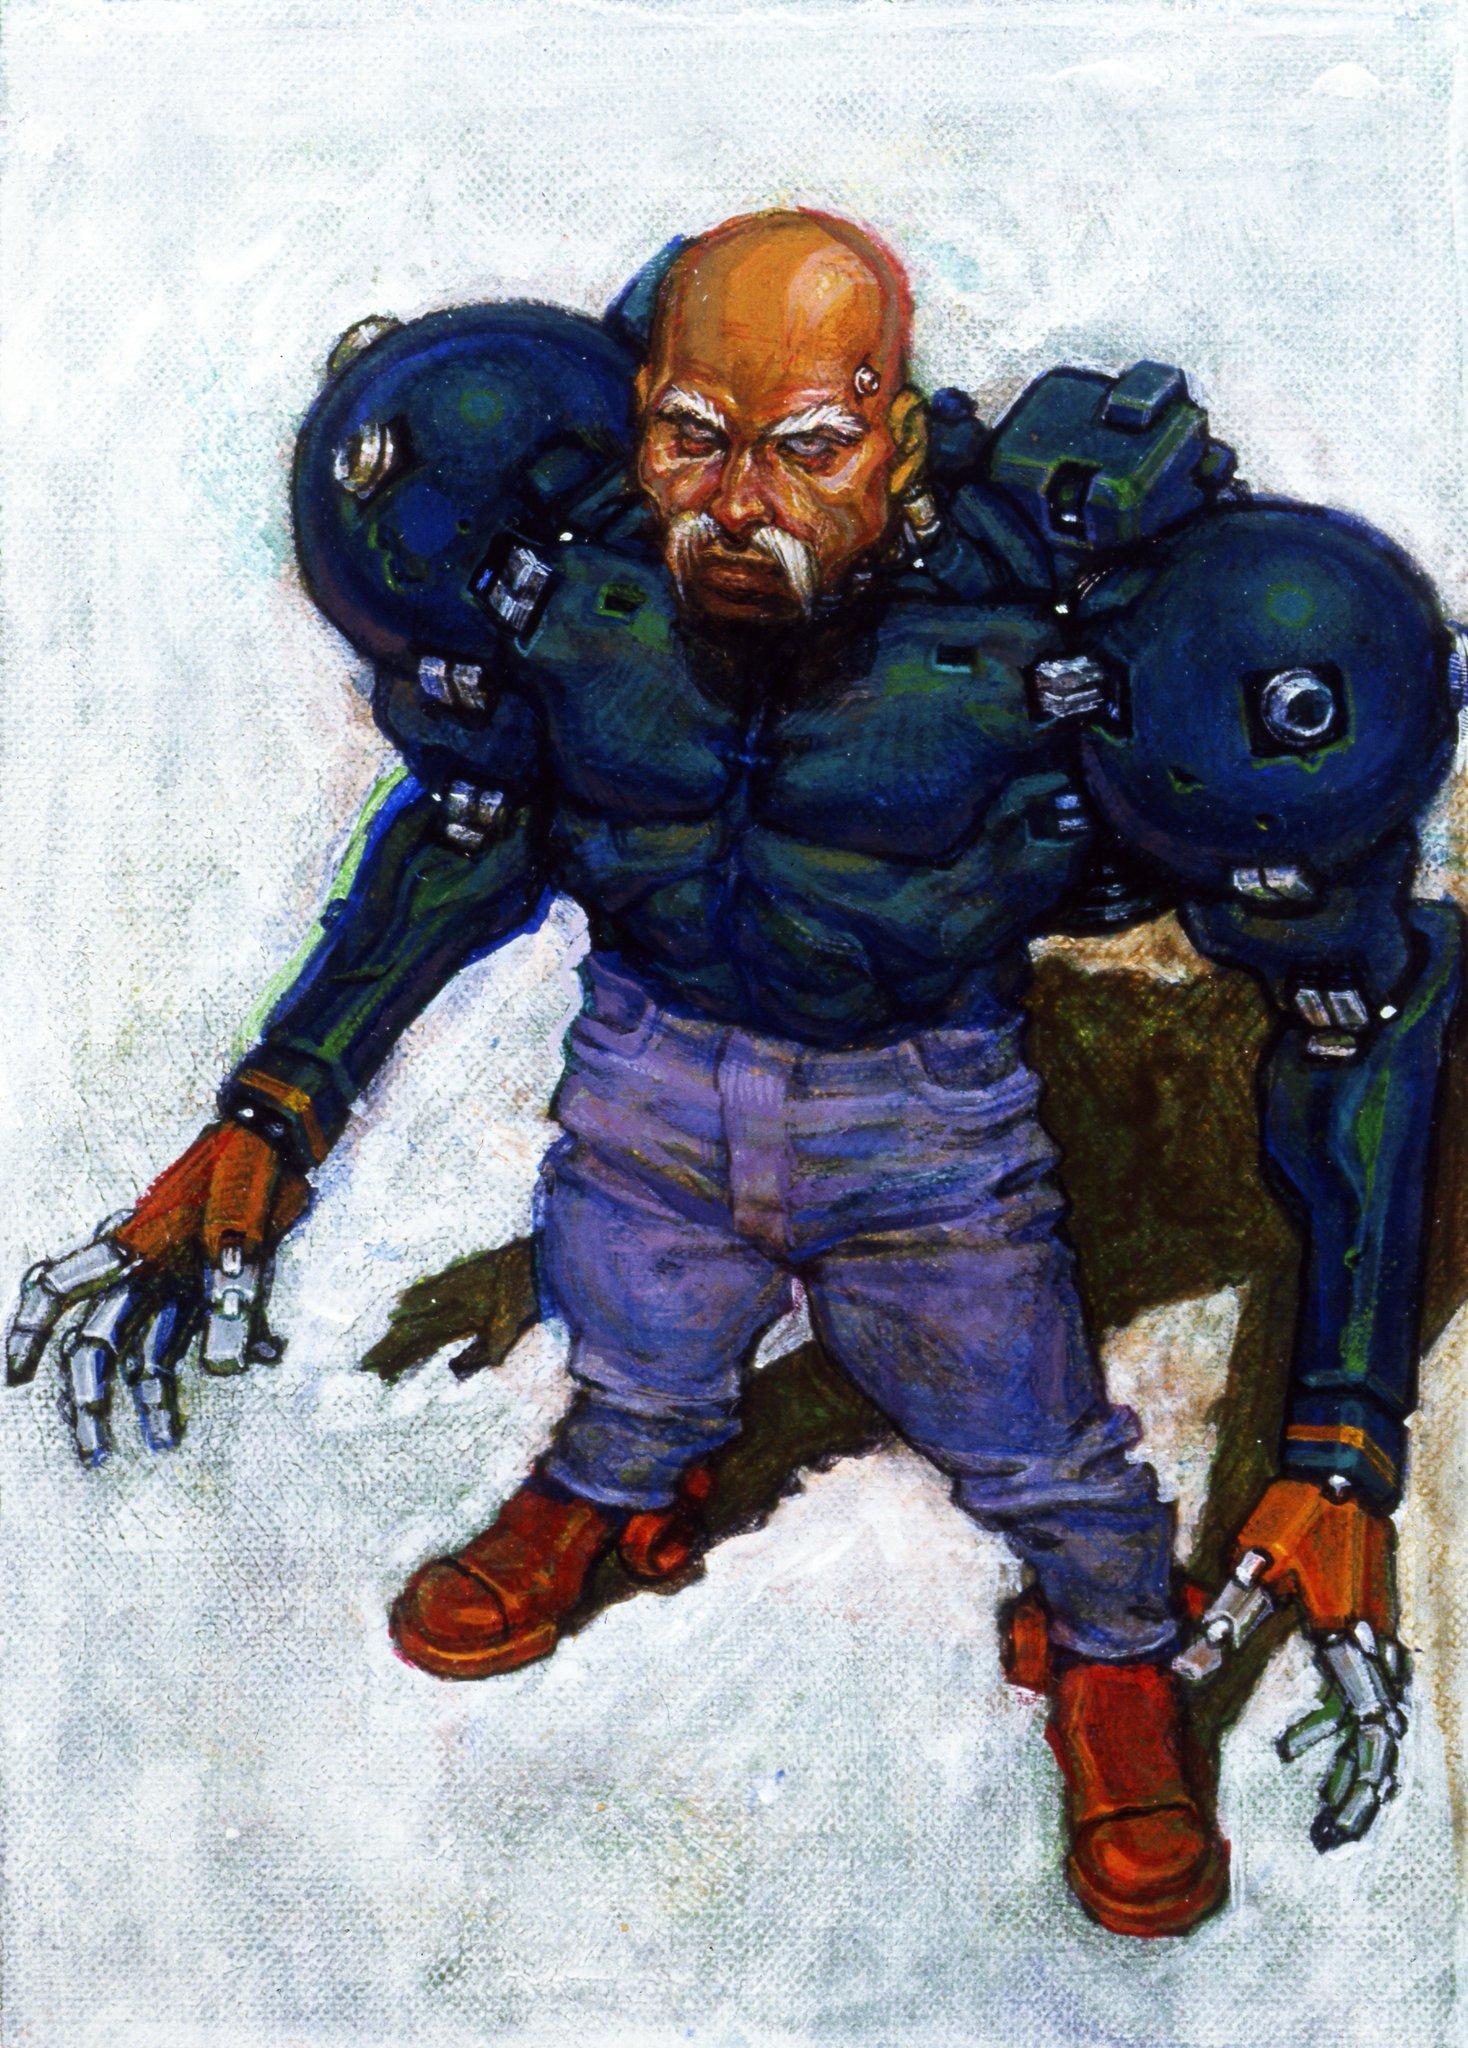 Genesis / 32X / SCD - Streets of Rage 3 - Zan - The ...  |Streets Of Rage 3 Zan